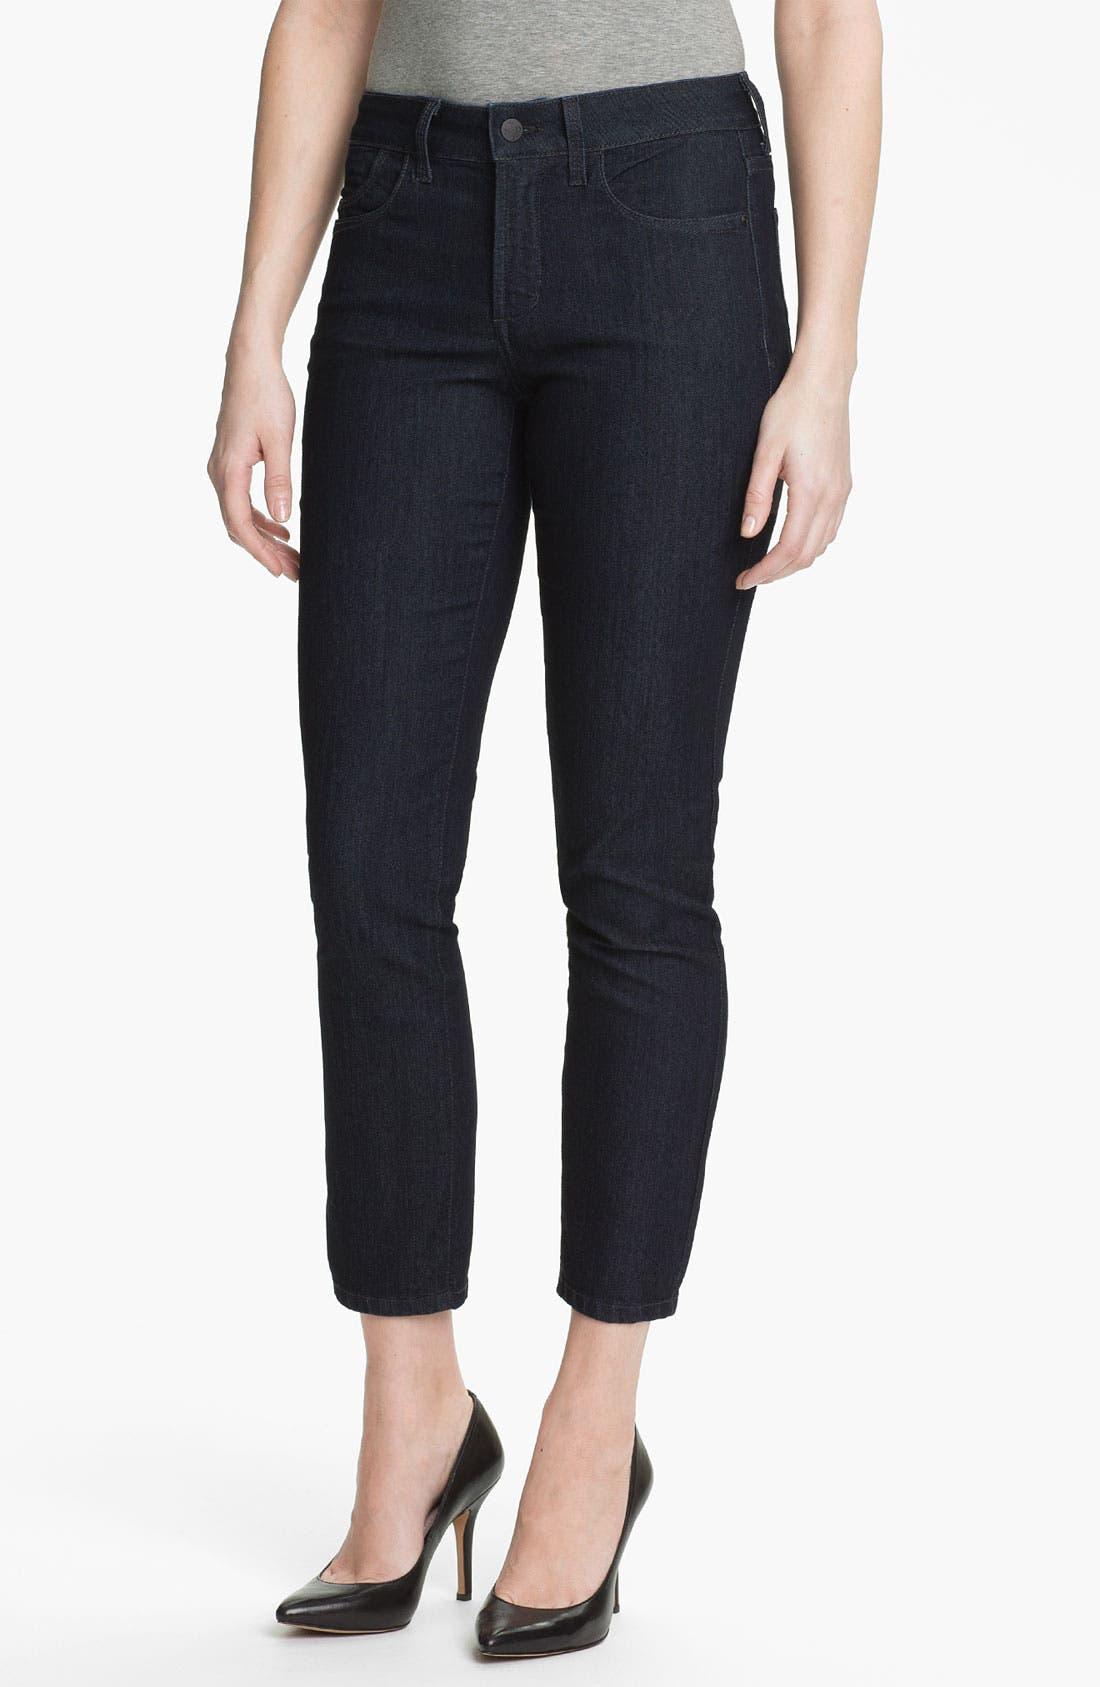 Main Image - NYDJ 'Alisha' Stretch Skinny Jeans (Petite)